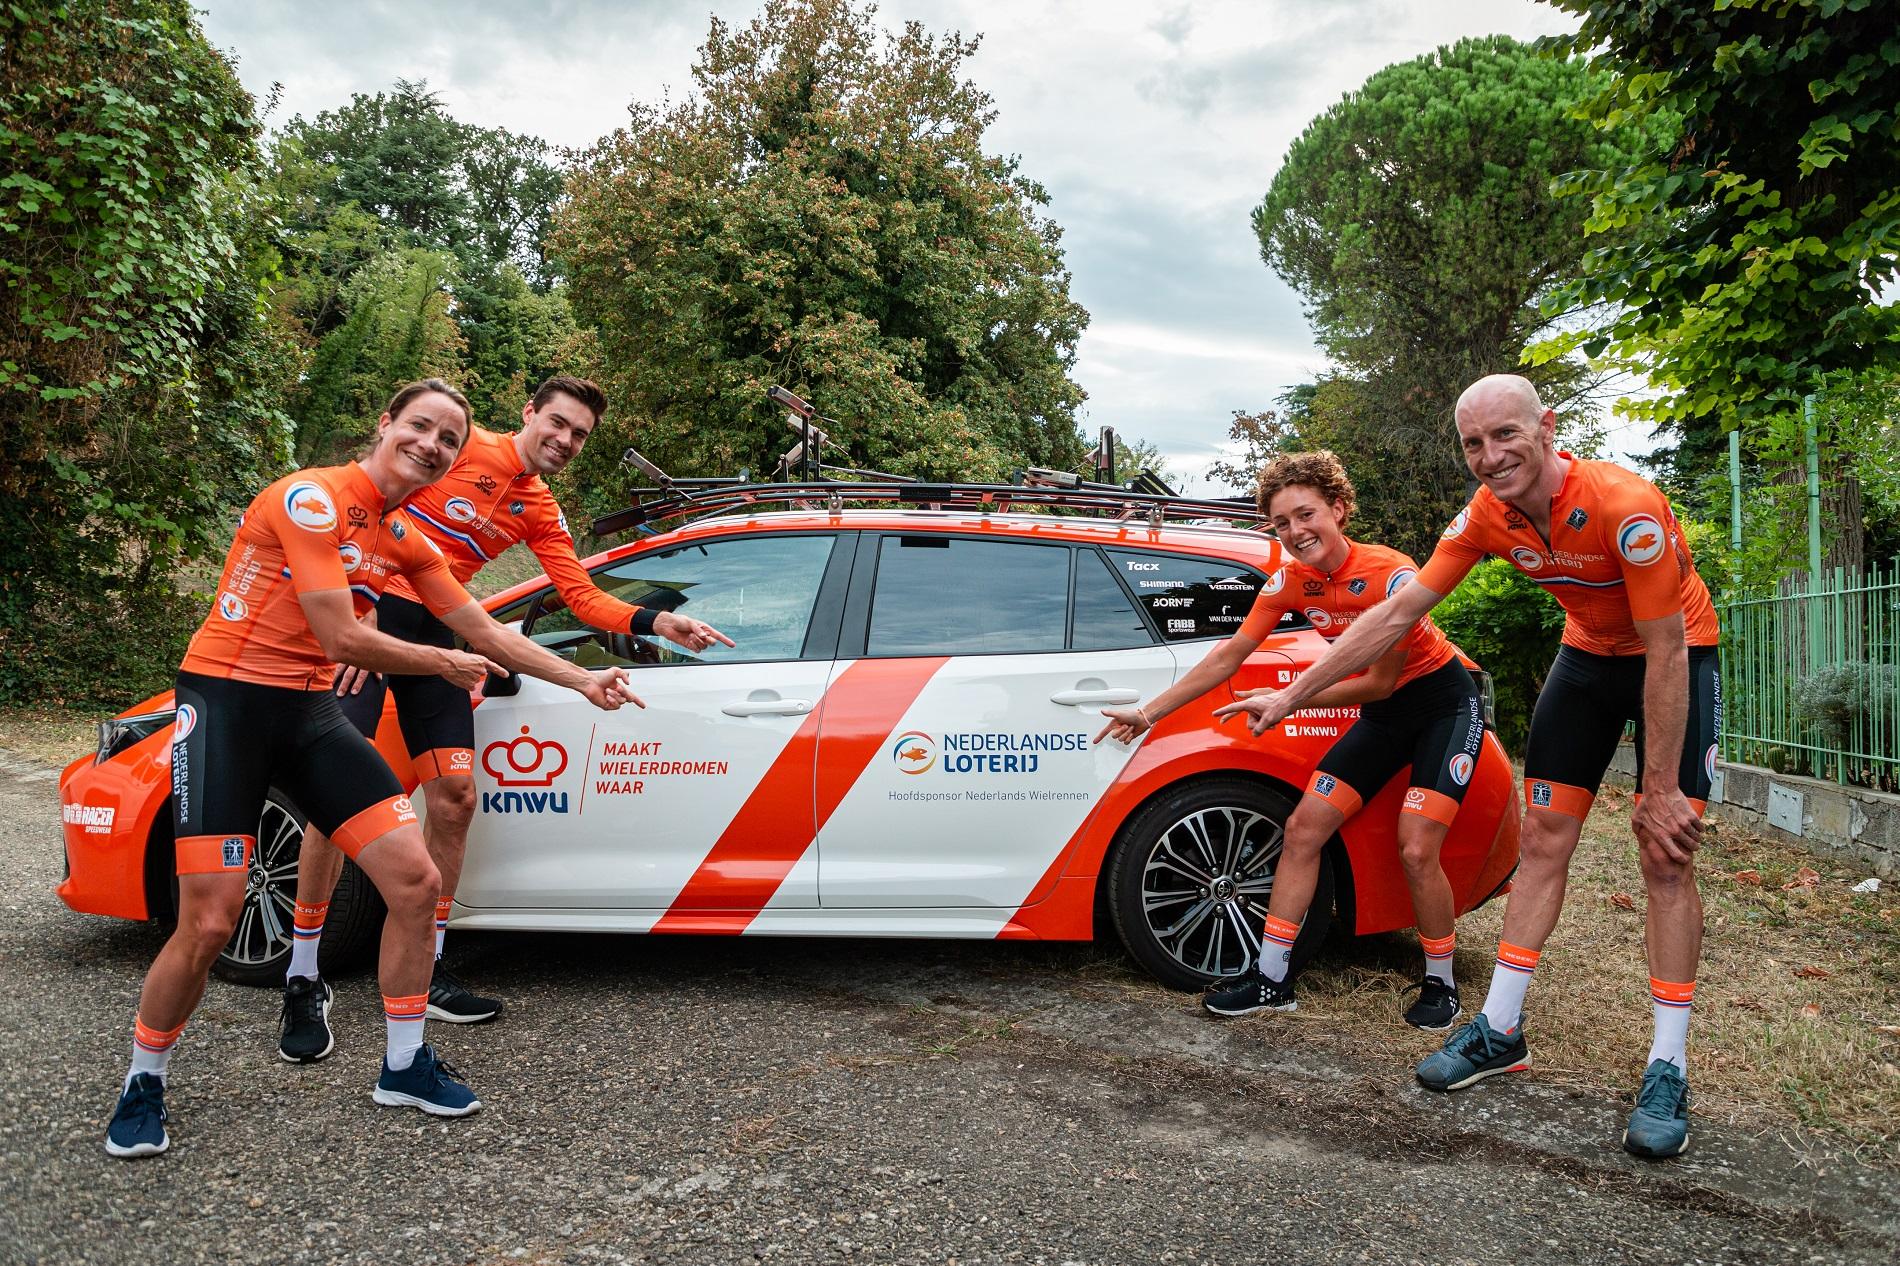 WK wegwielrennen, Imola